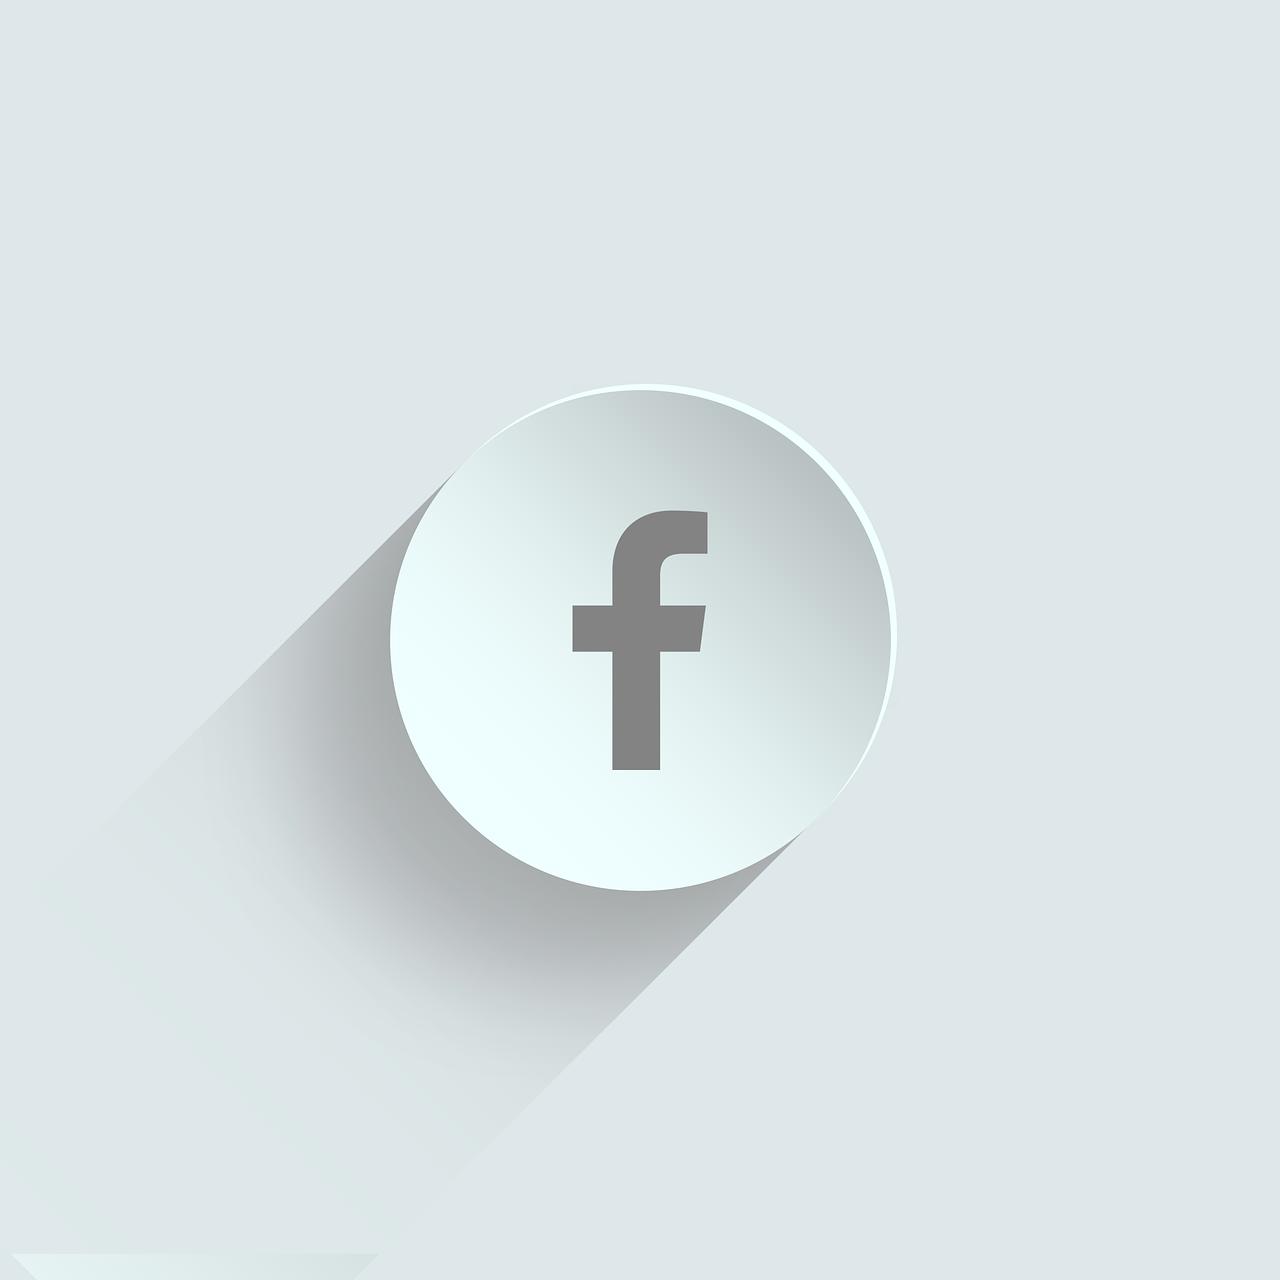 Facebook Ad Campaign Strategies